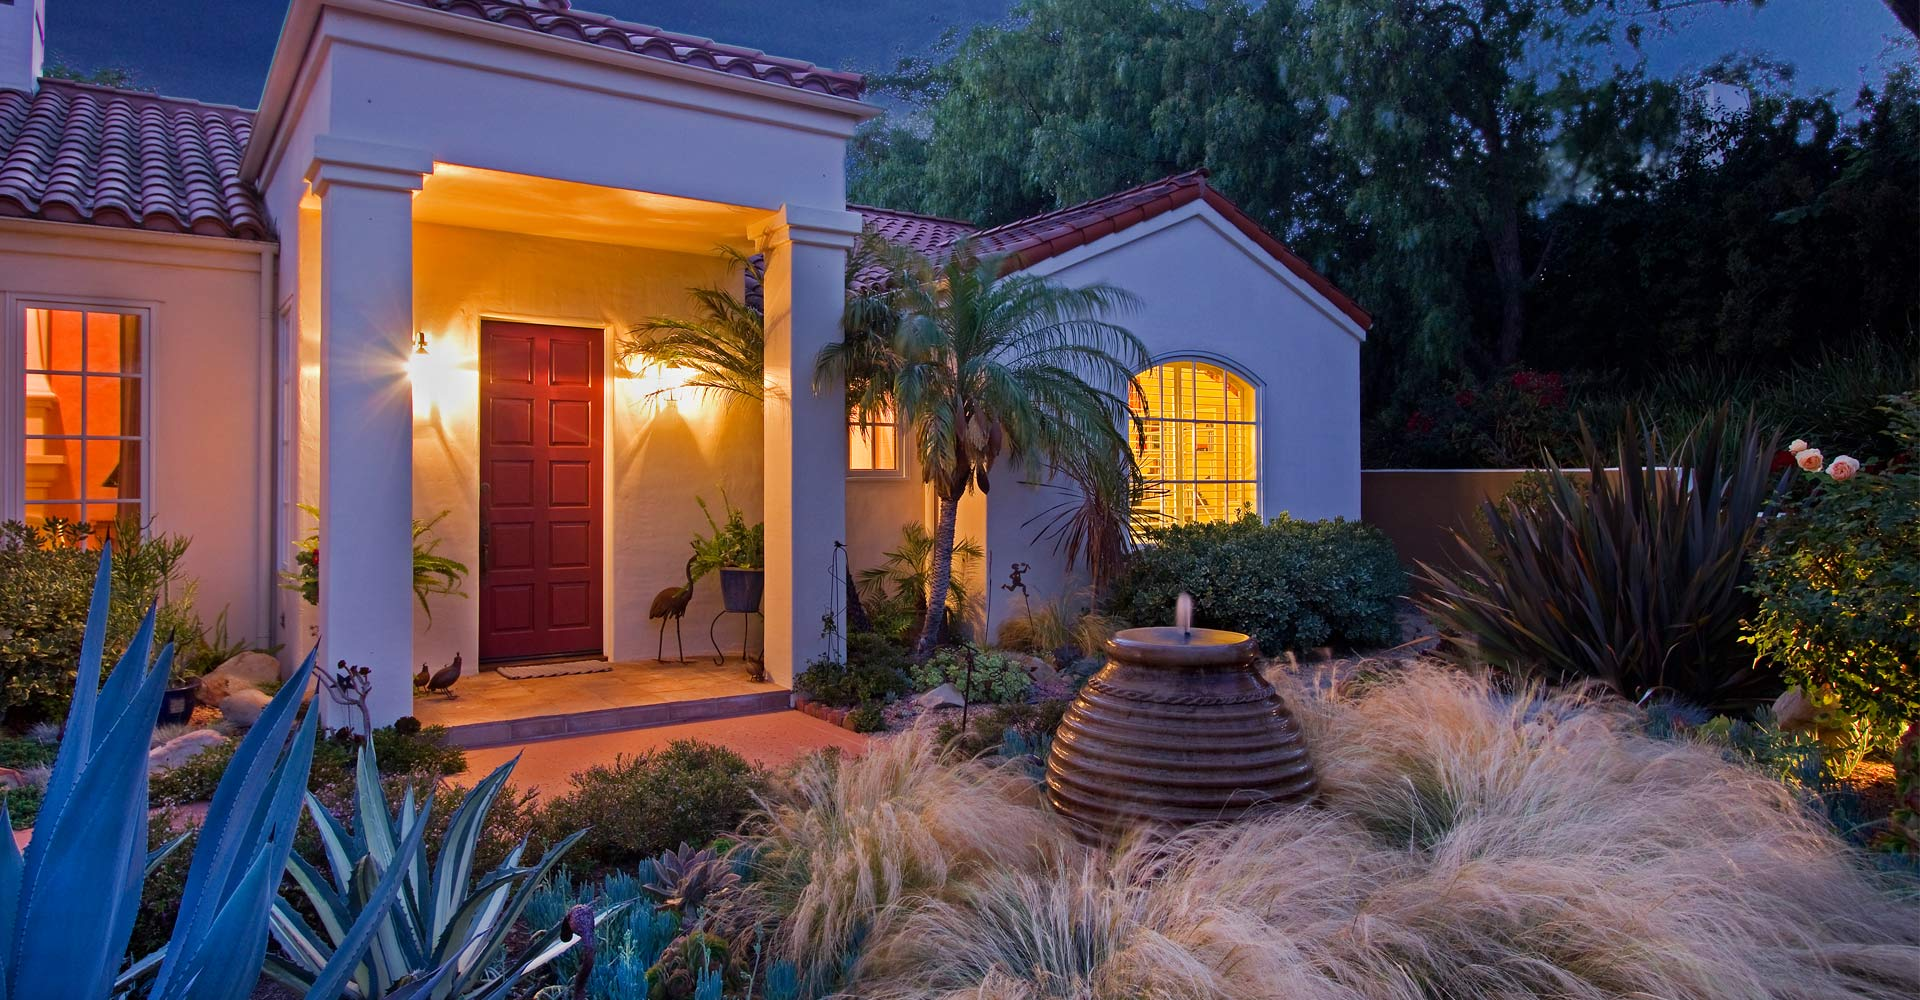 golet real estate, goleta home, pic of goleta homes for sale